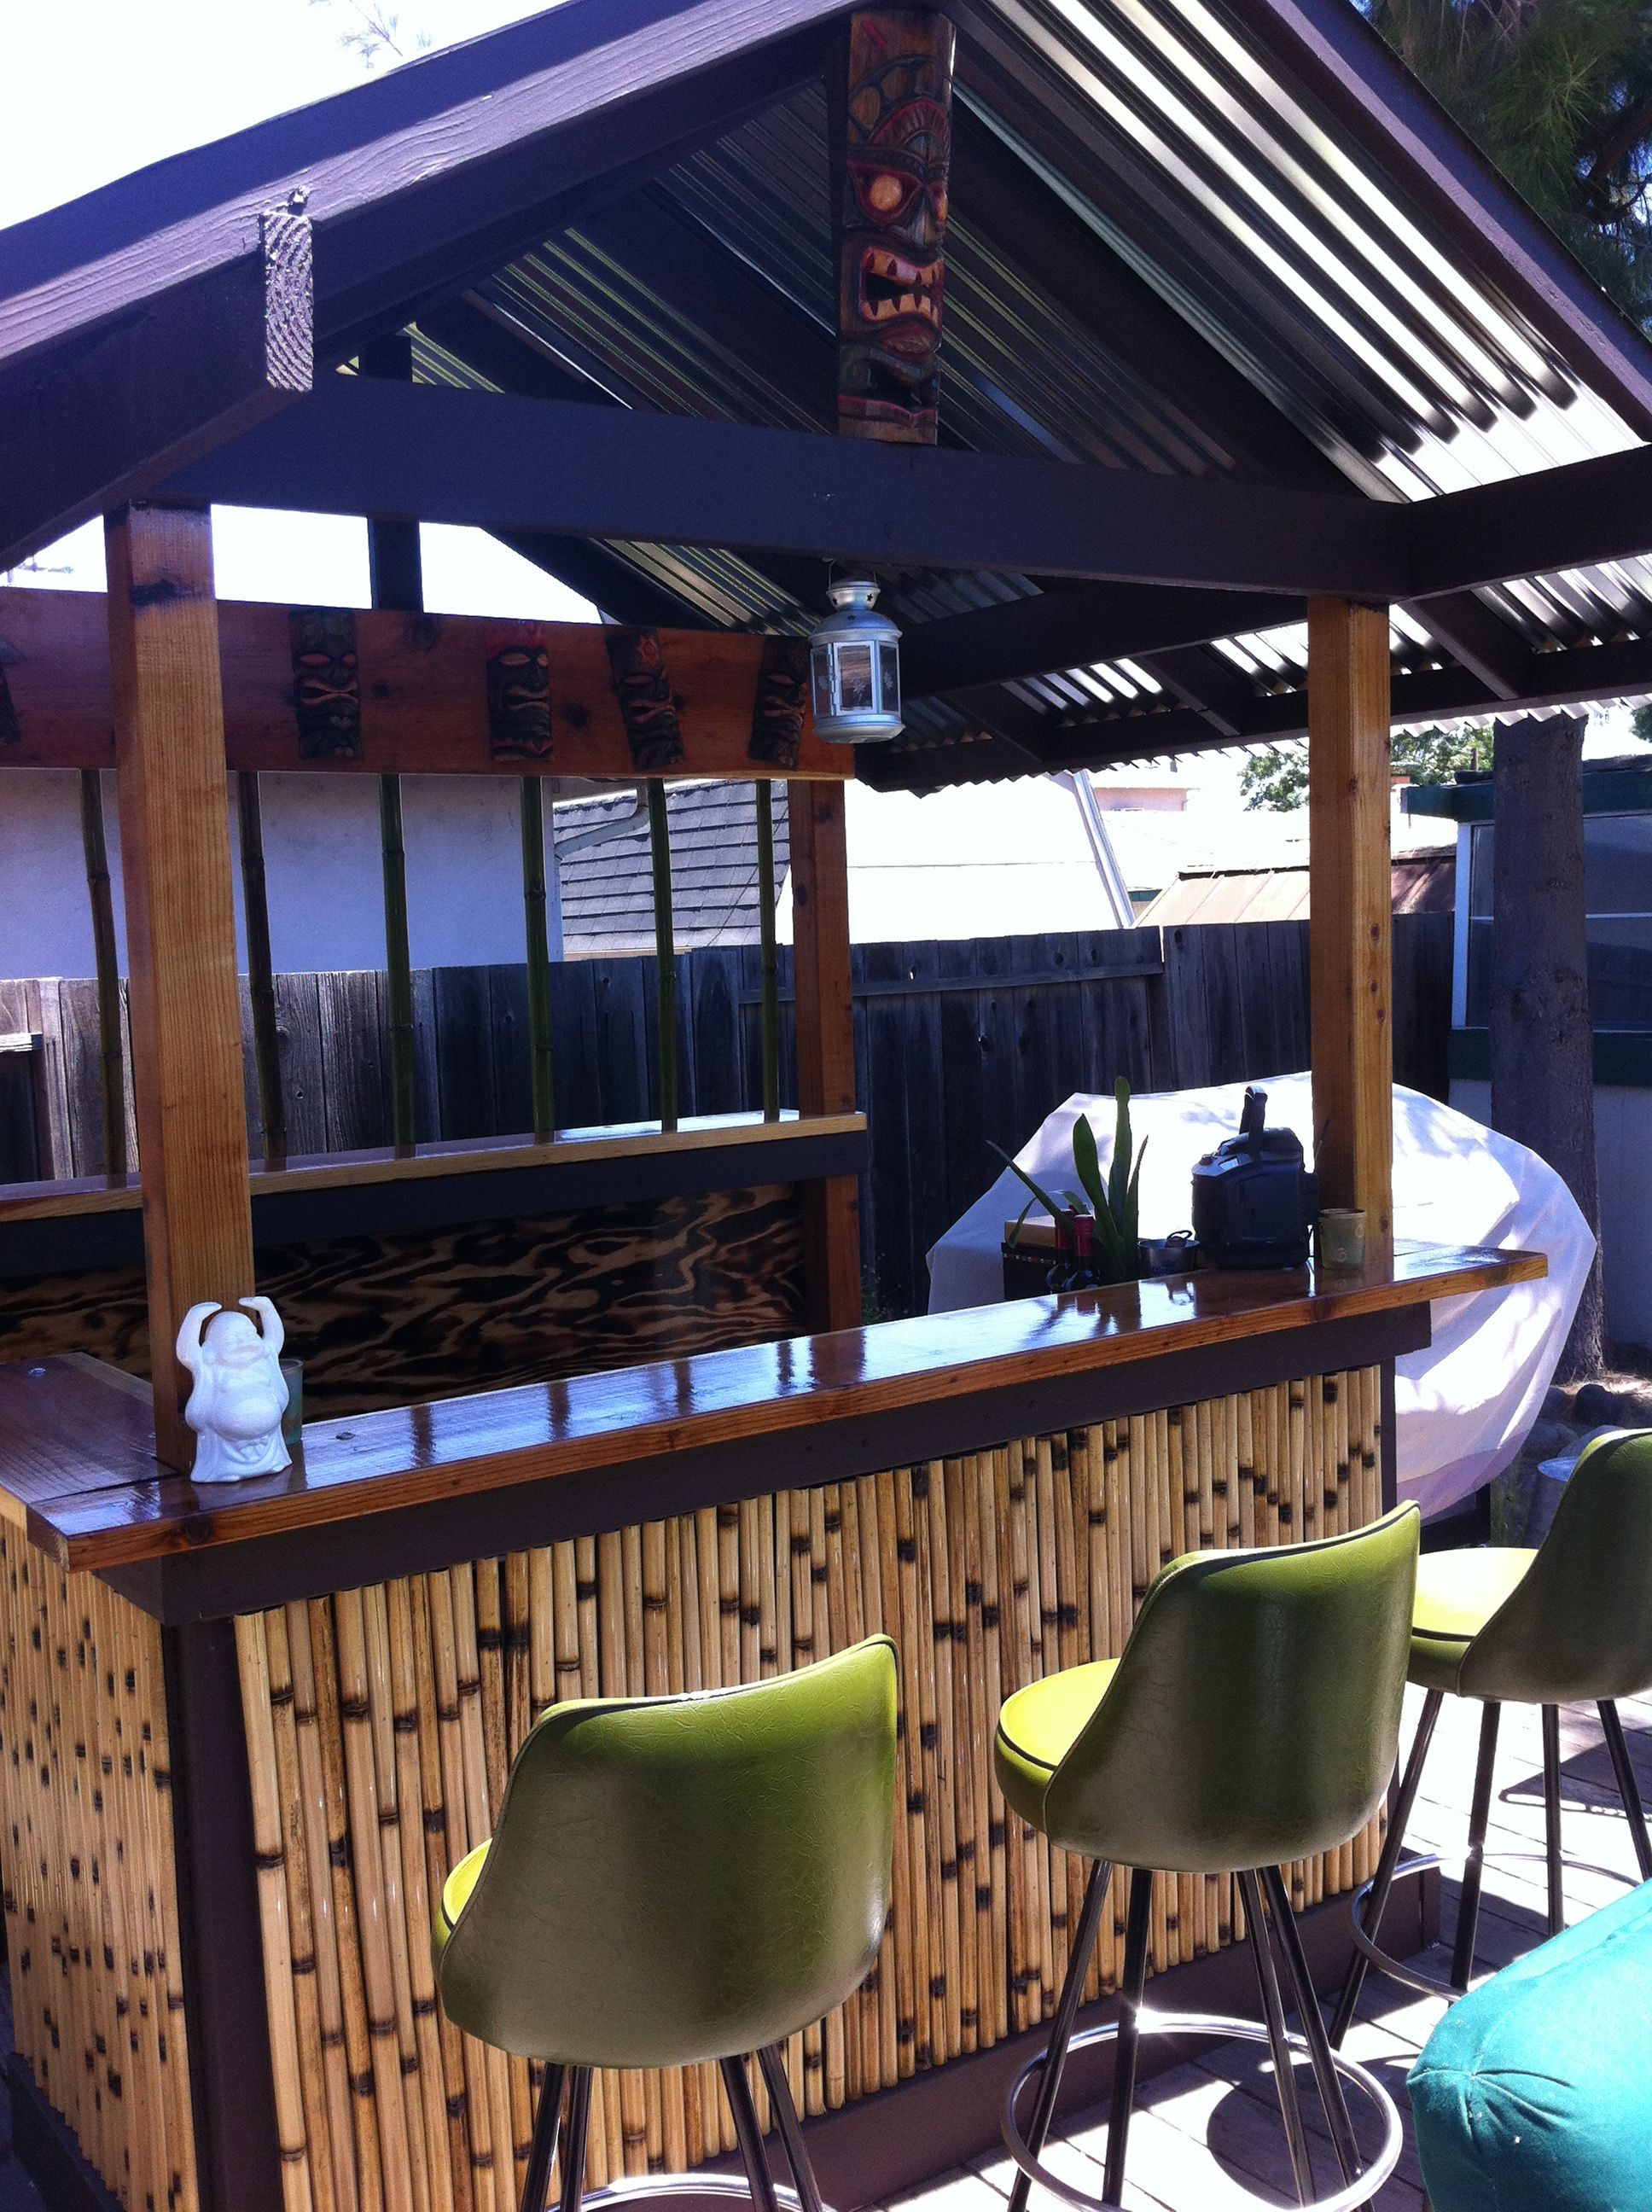 KC's Tiki Bar #tiki #tikibar #bar | The Tiki Life ...